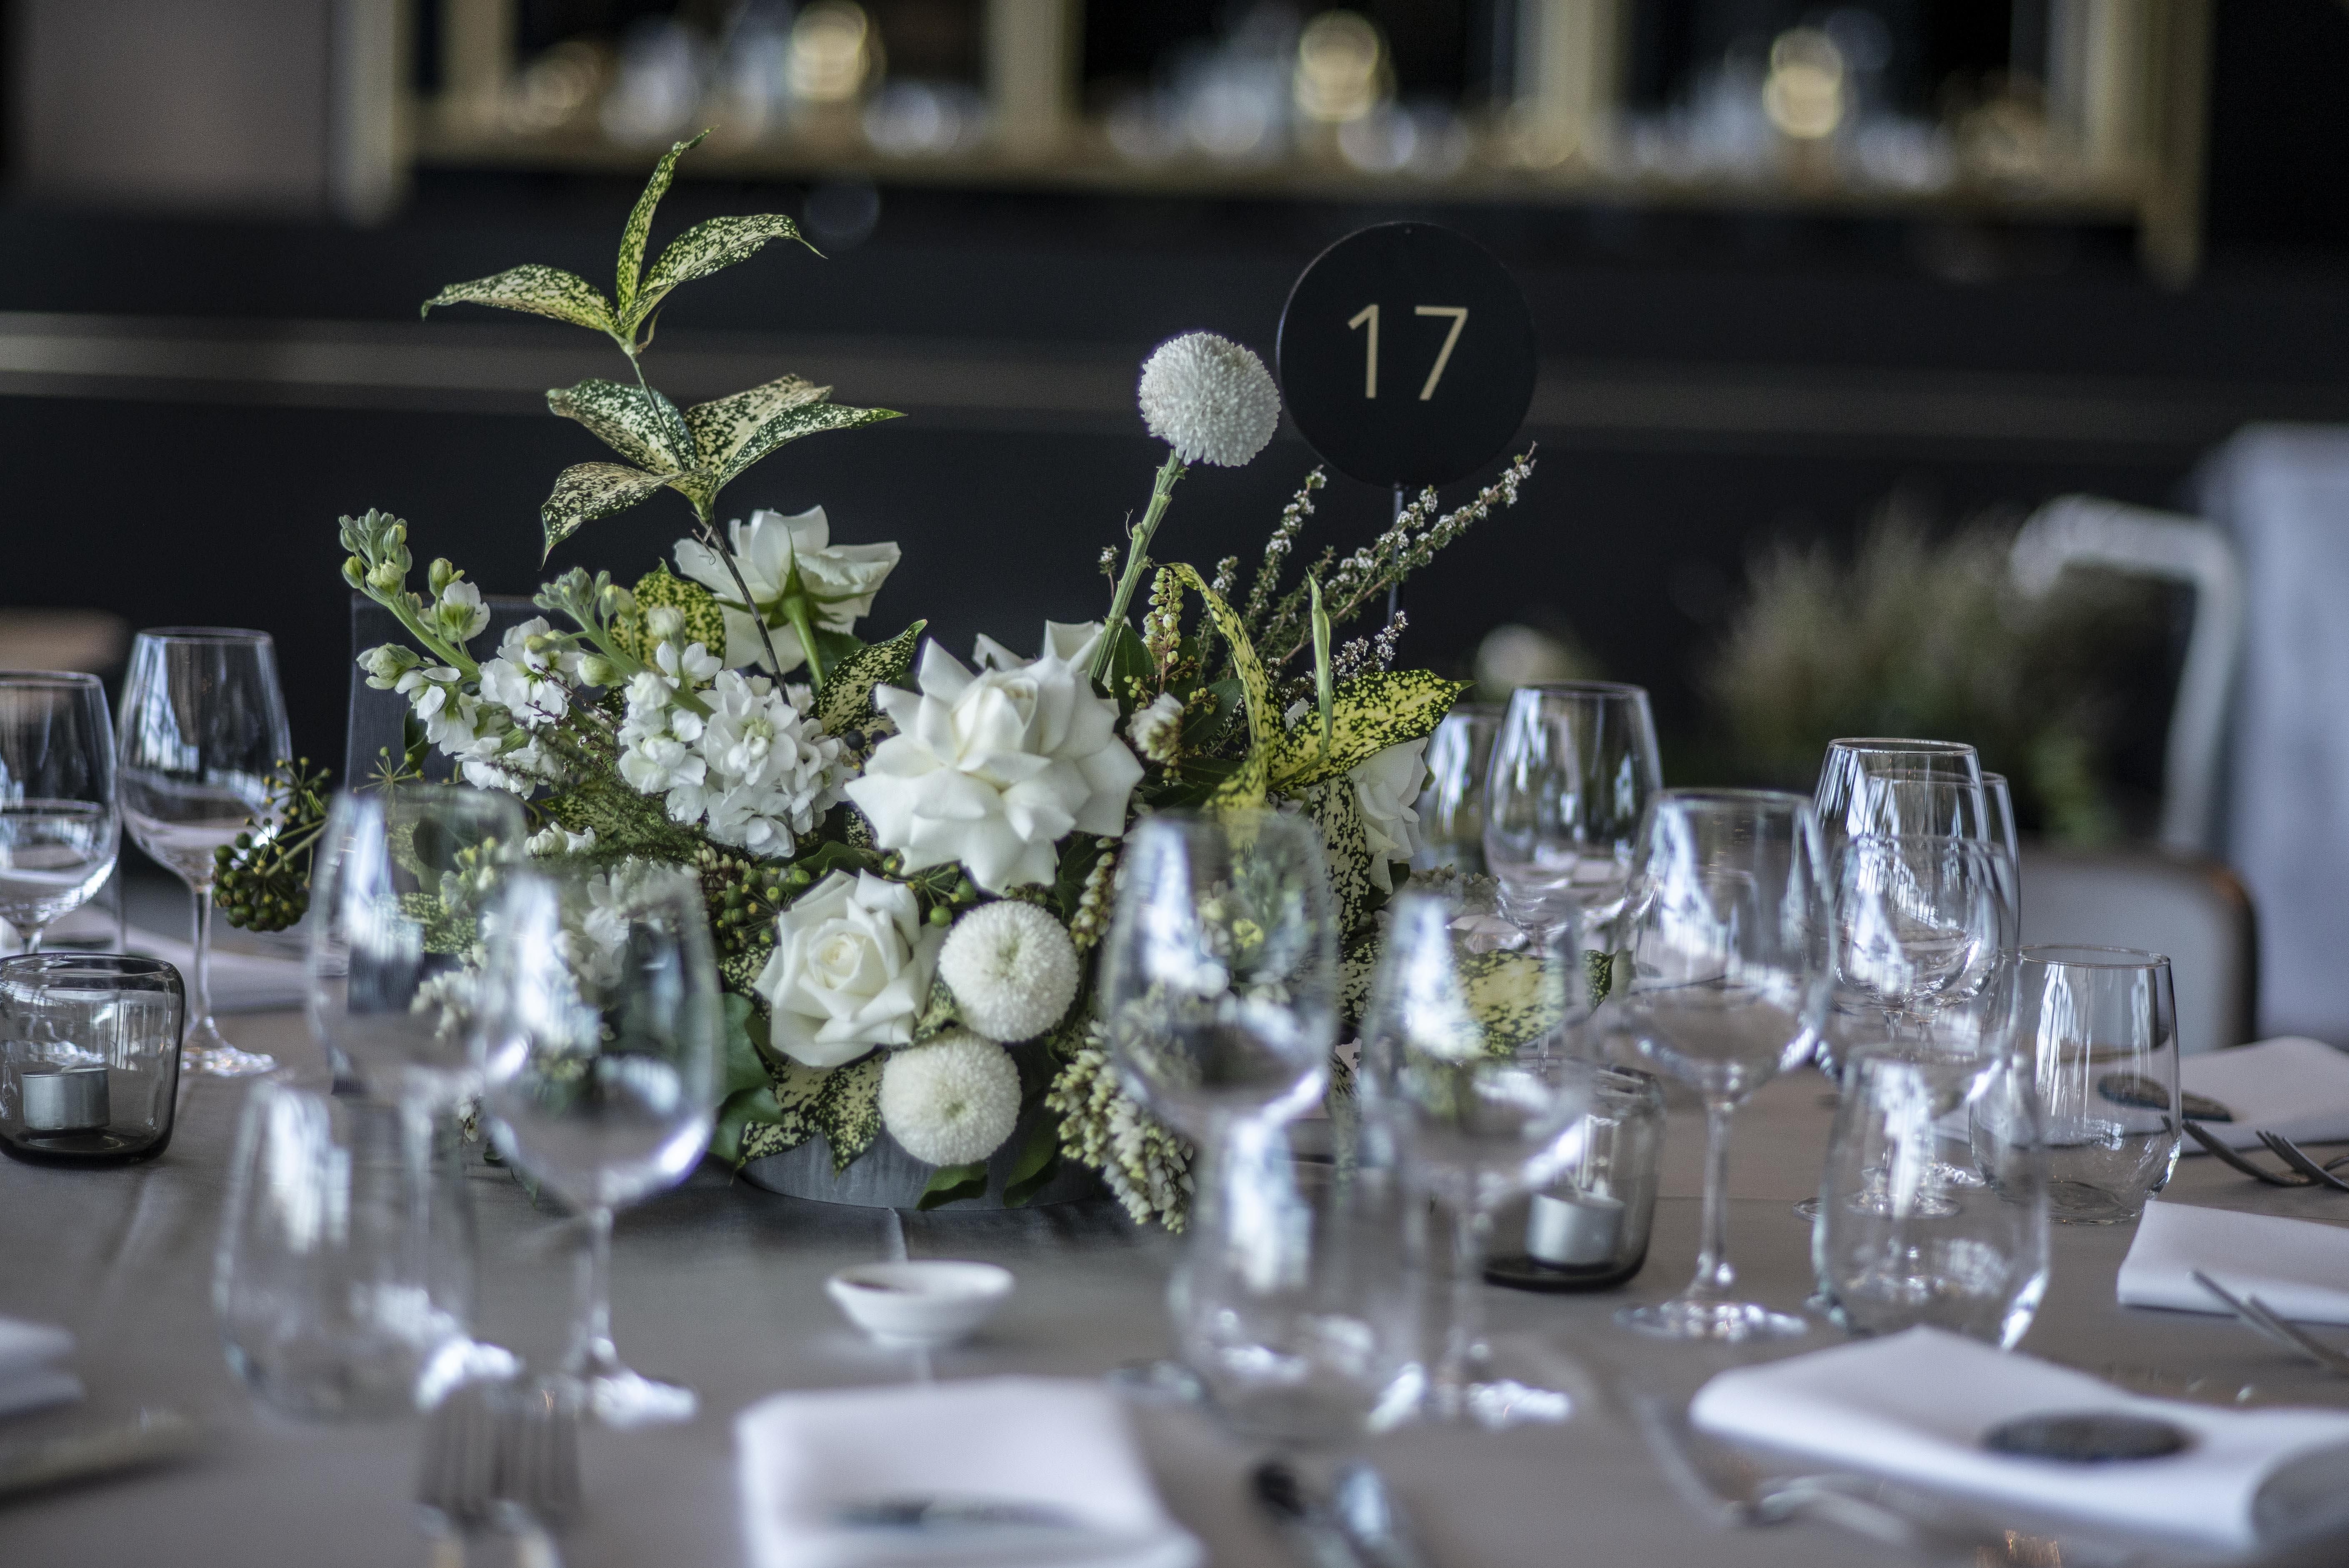 Wedding reception table centrepieces